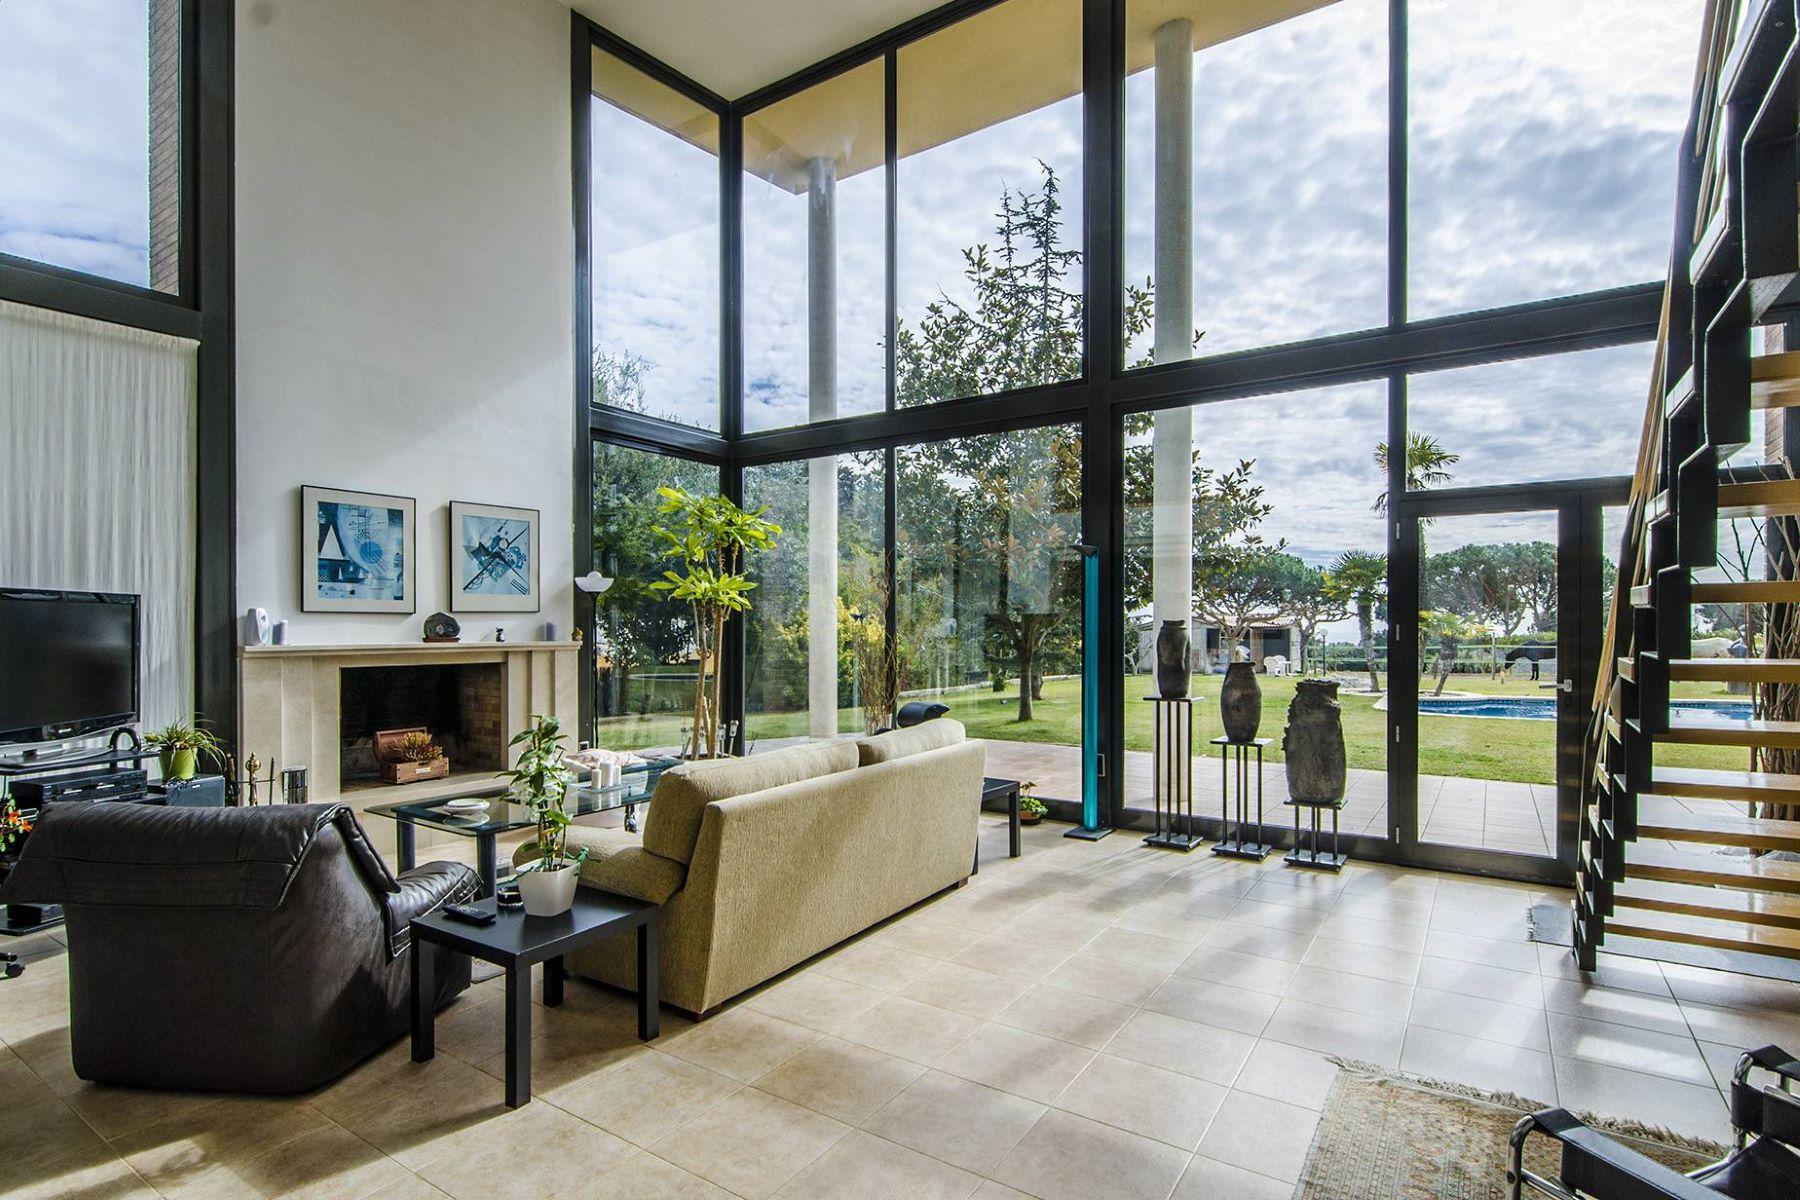 Single Family Home for Sale at Exclusive Property in Rocaferrera Sant Andreu De Llavaneres, Barcelona, 08392 Spain